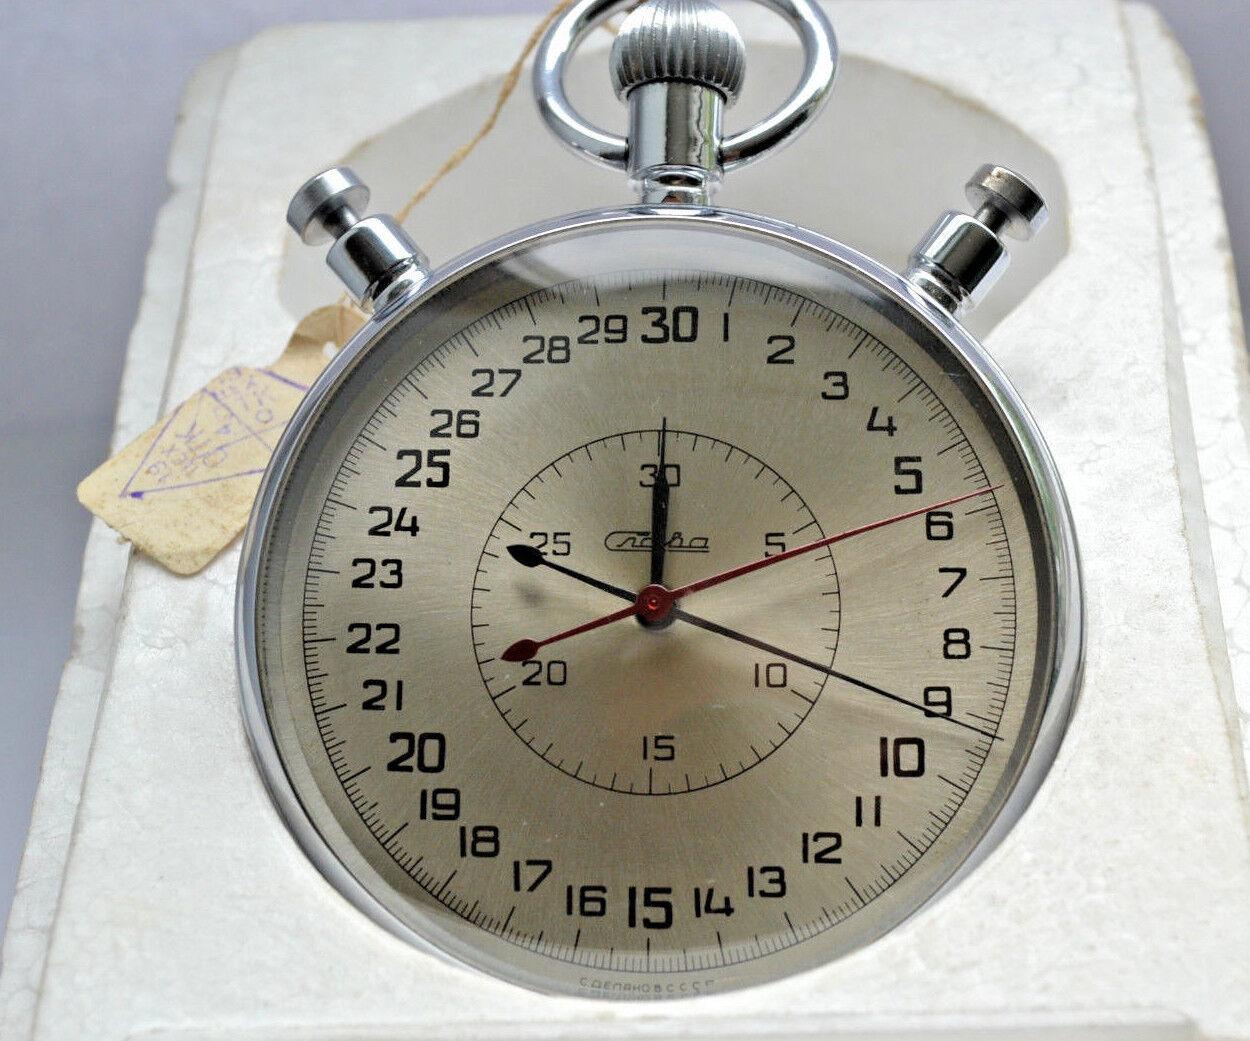 Stopwatch Chronometer SLAVA in original box USSR Vintage 20 jewels EXCELLENT